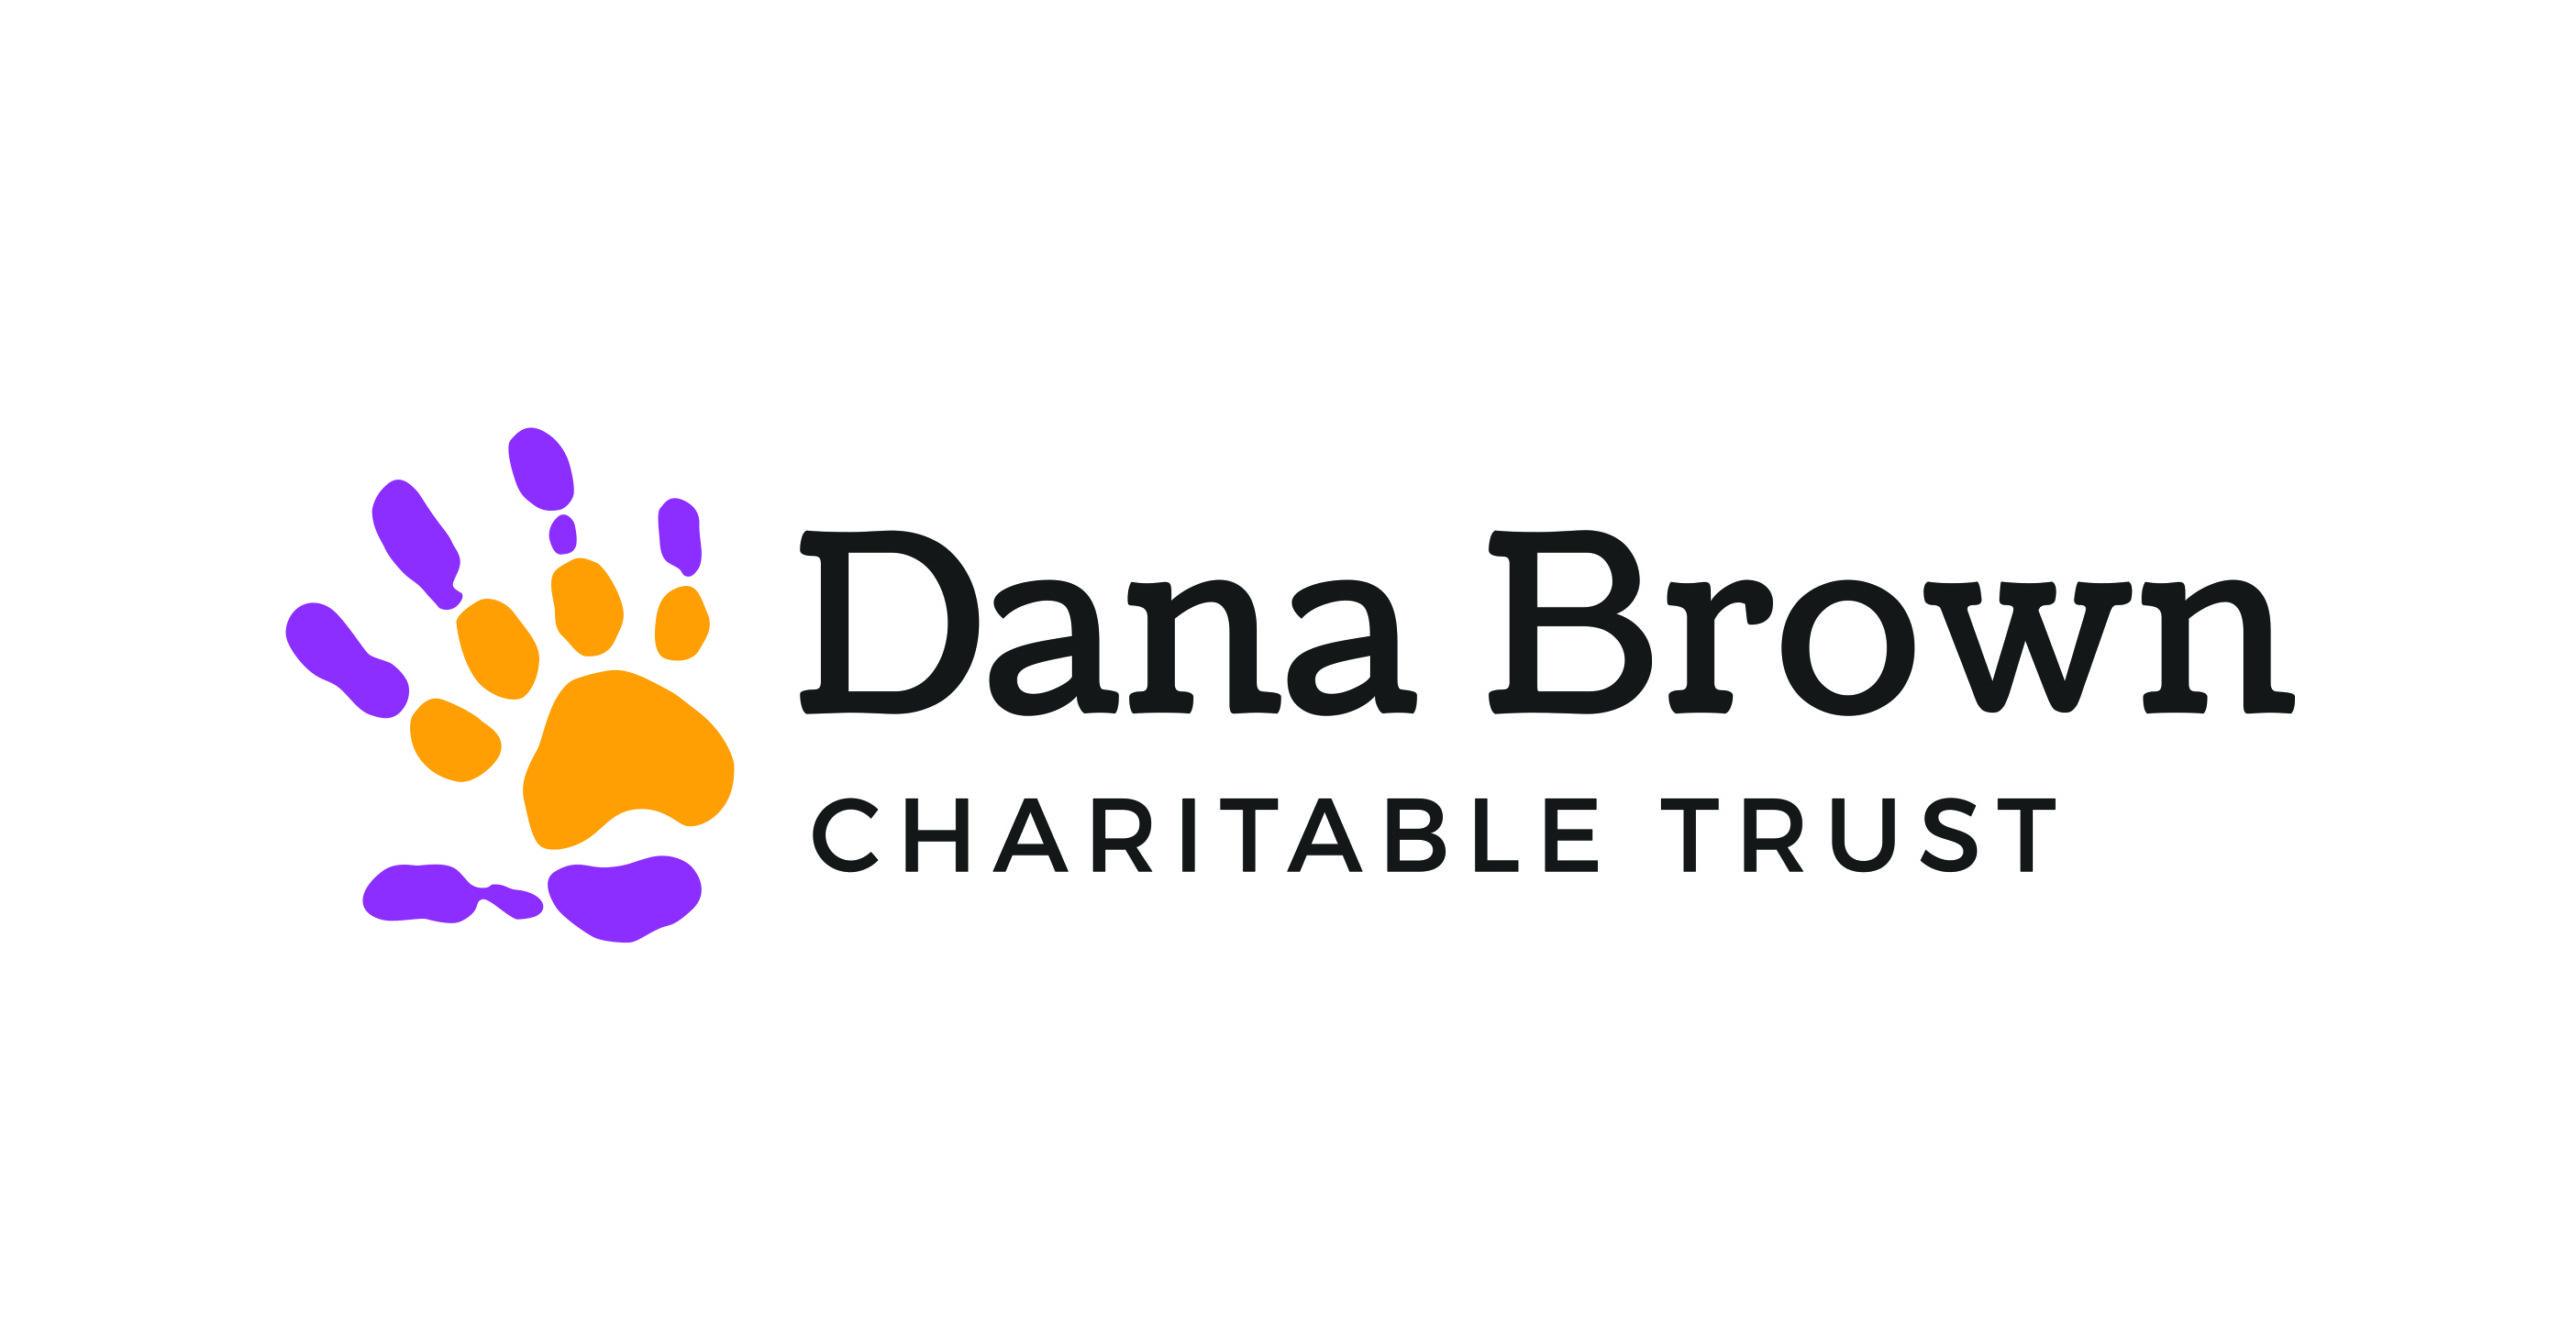 gkaspartnerlogos_0004_Dana-Brown-Logo-primary-color-rgb-07.19.16.jpg